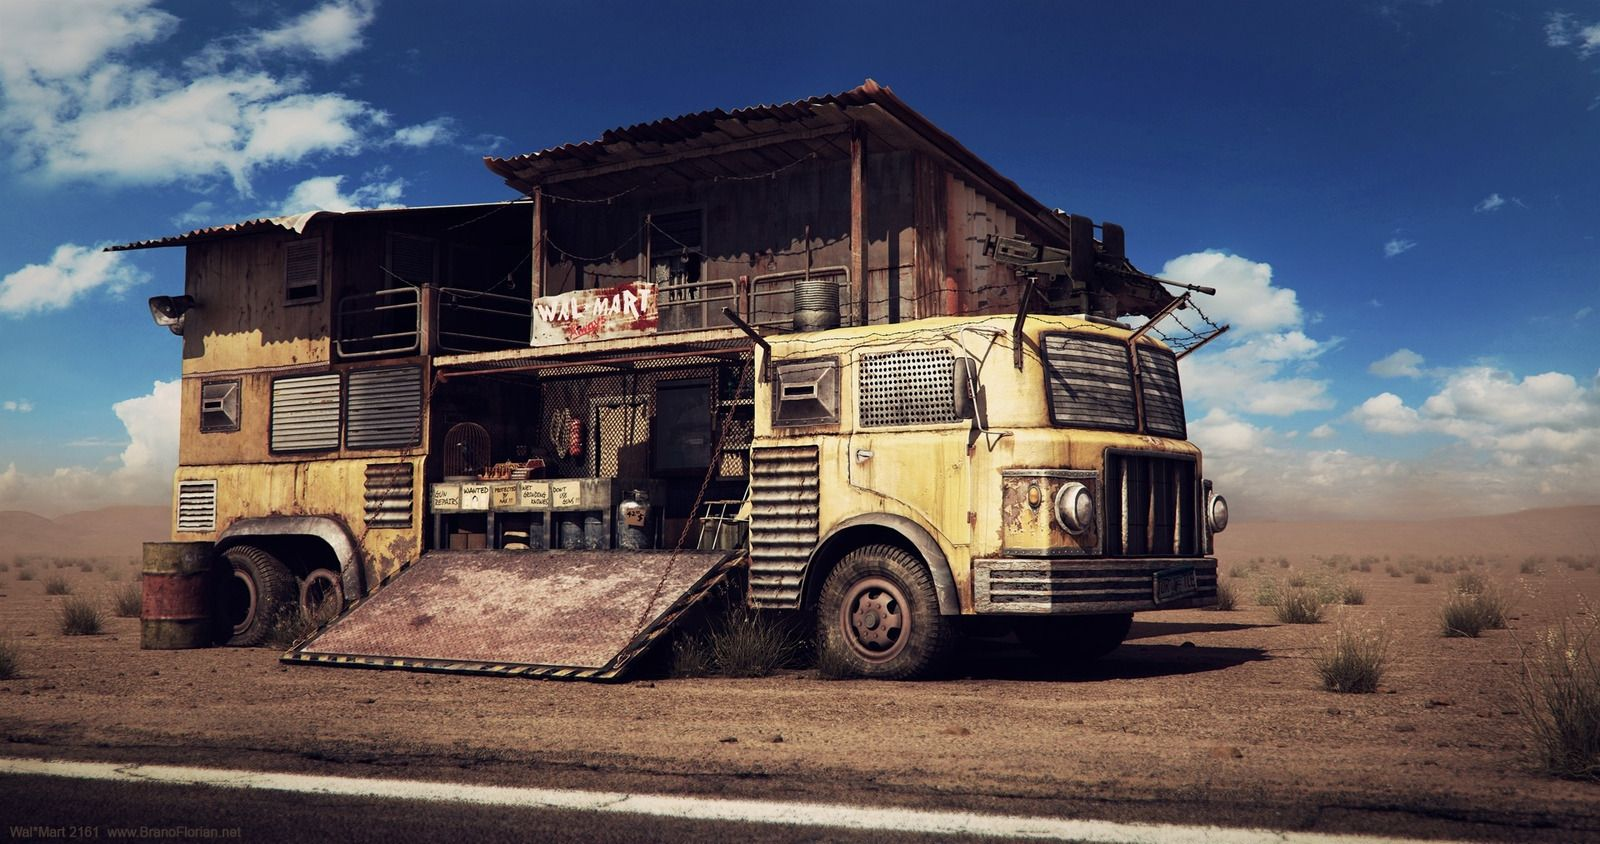 Wal-mart 2161 3d Truck Fallout Post